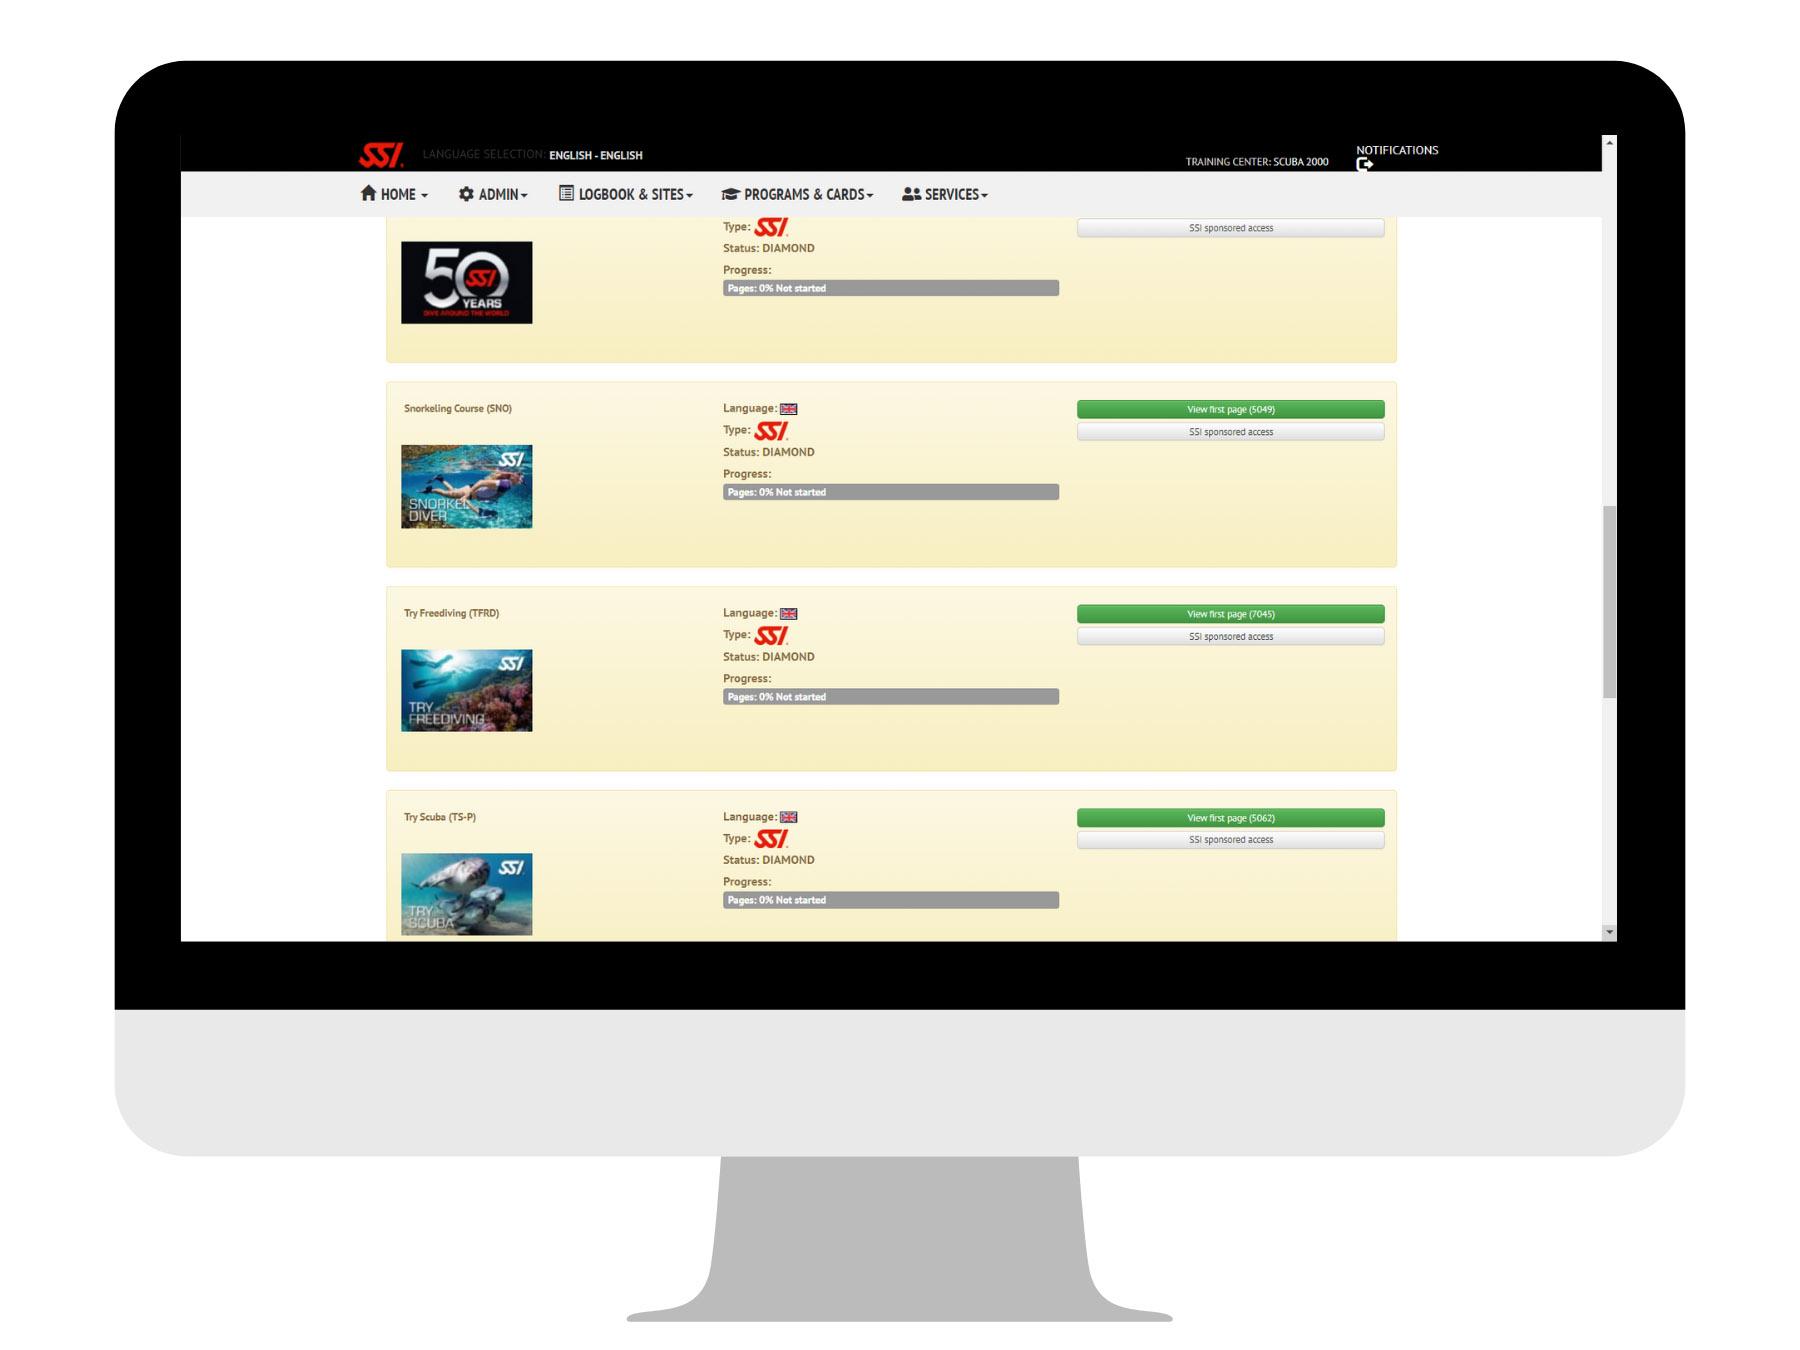 Scuba 2000 - MySSI - free online SSI courses